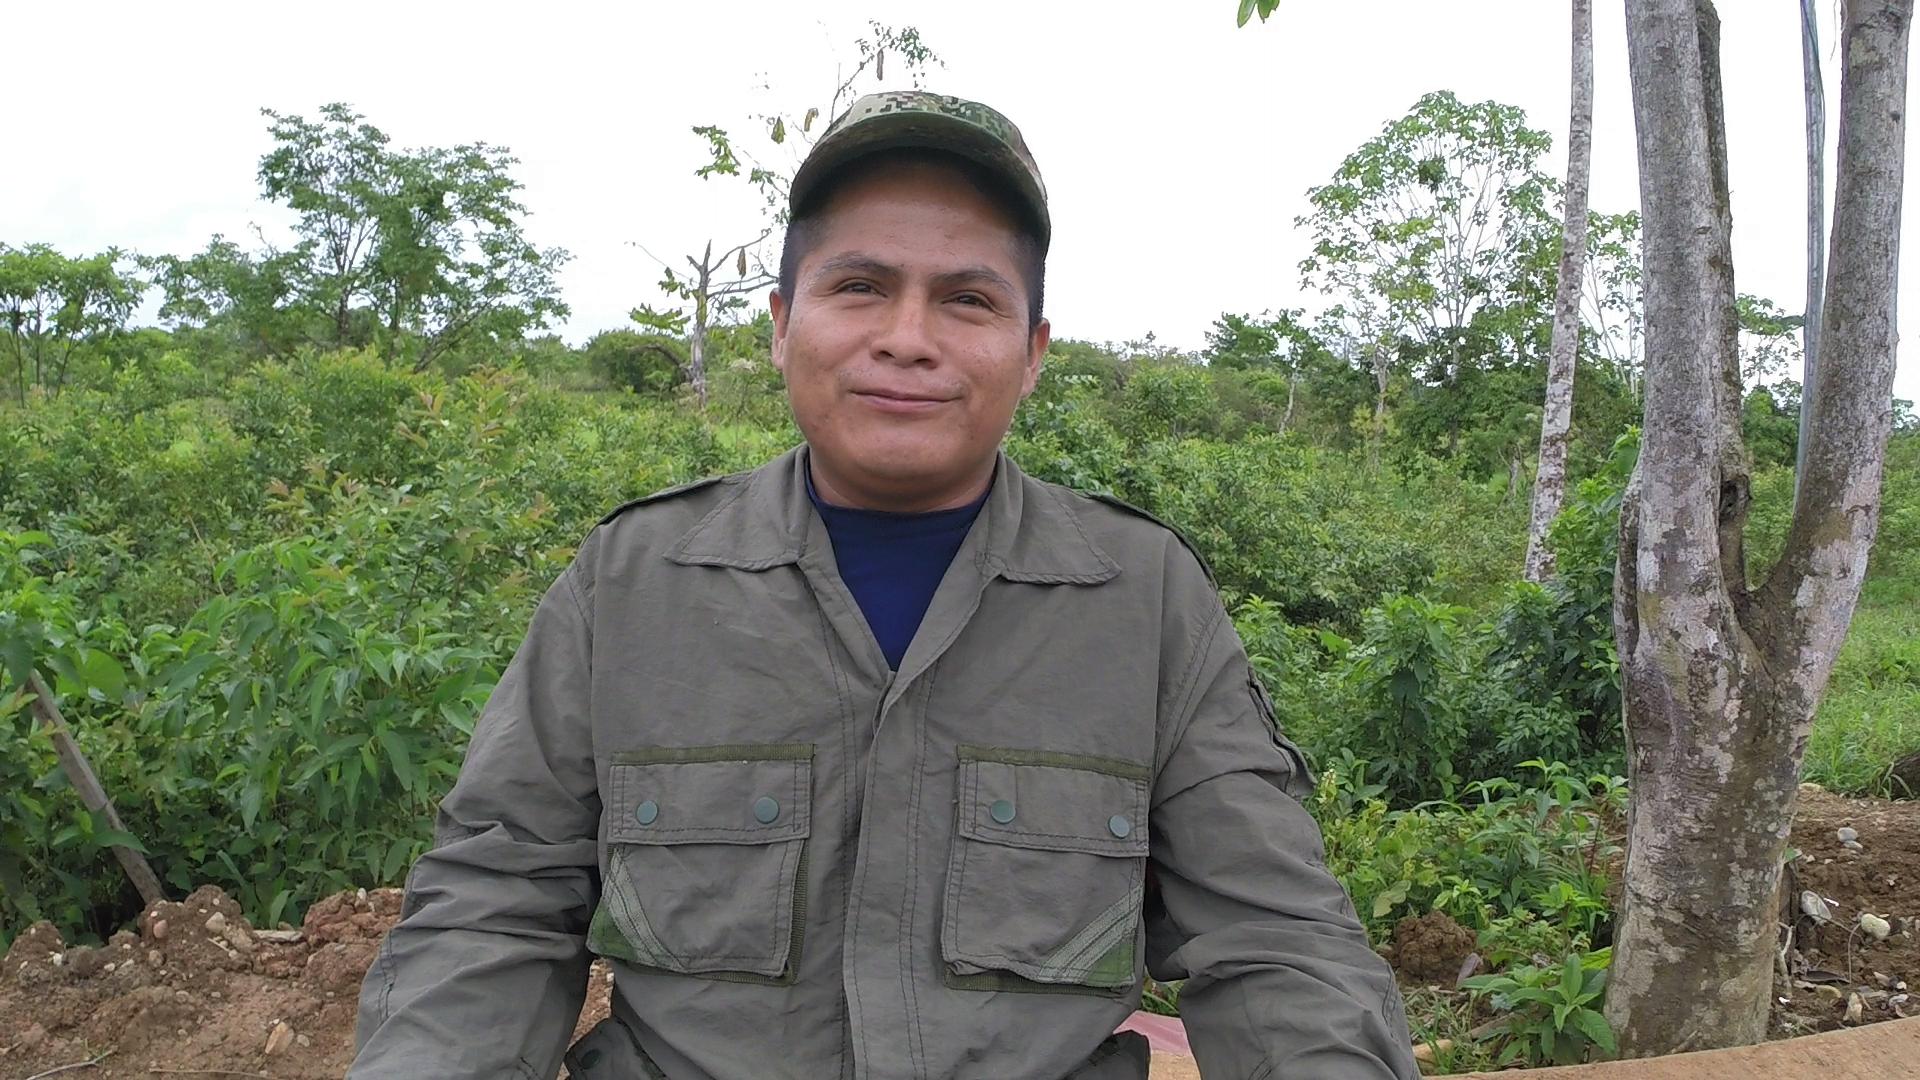 Franklin Valdez, guerrillero ecuatoriano de las FARC